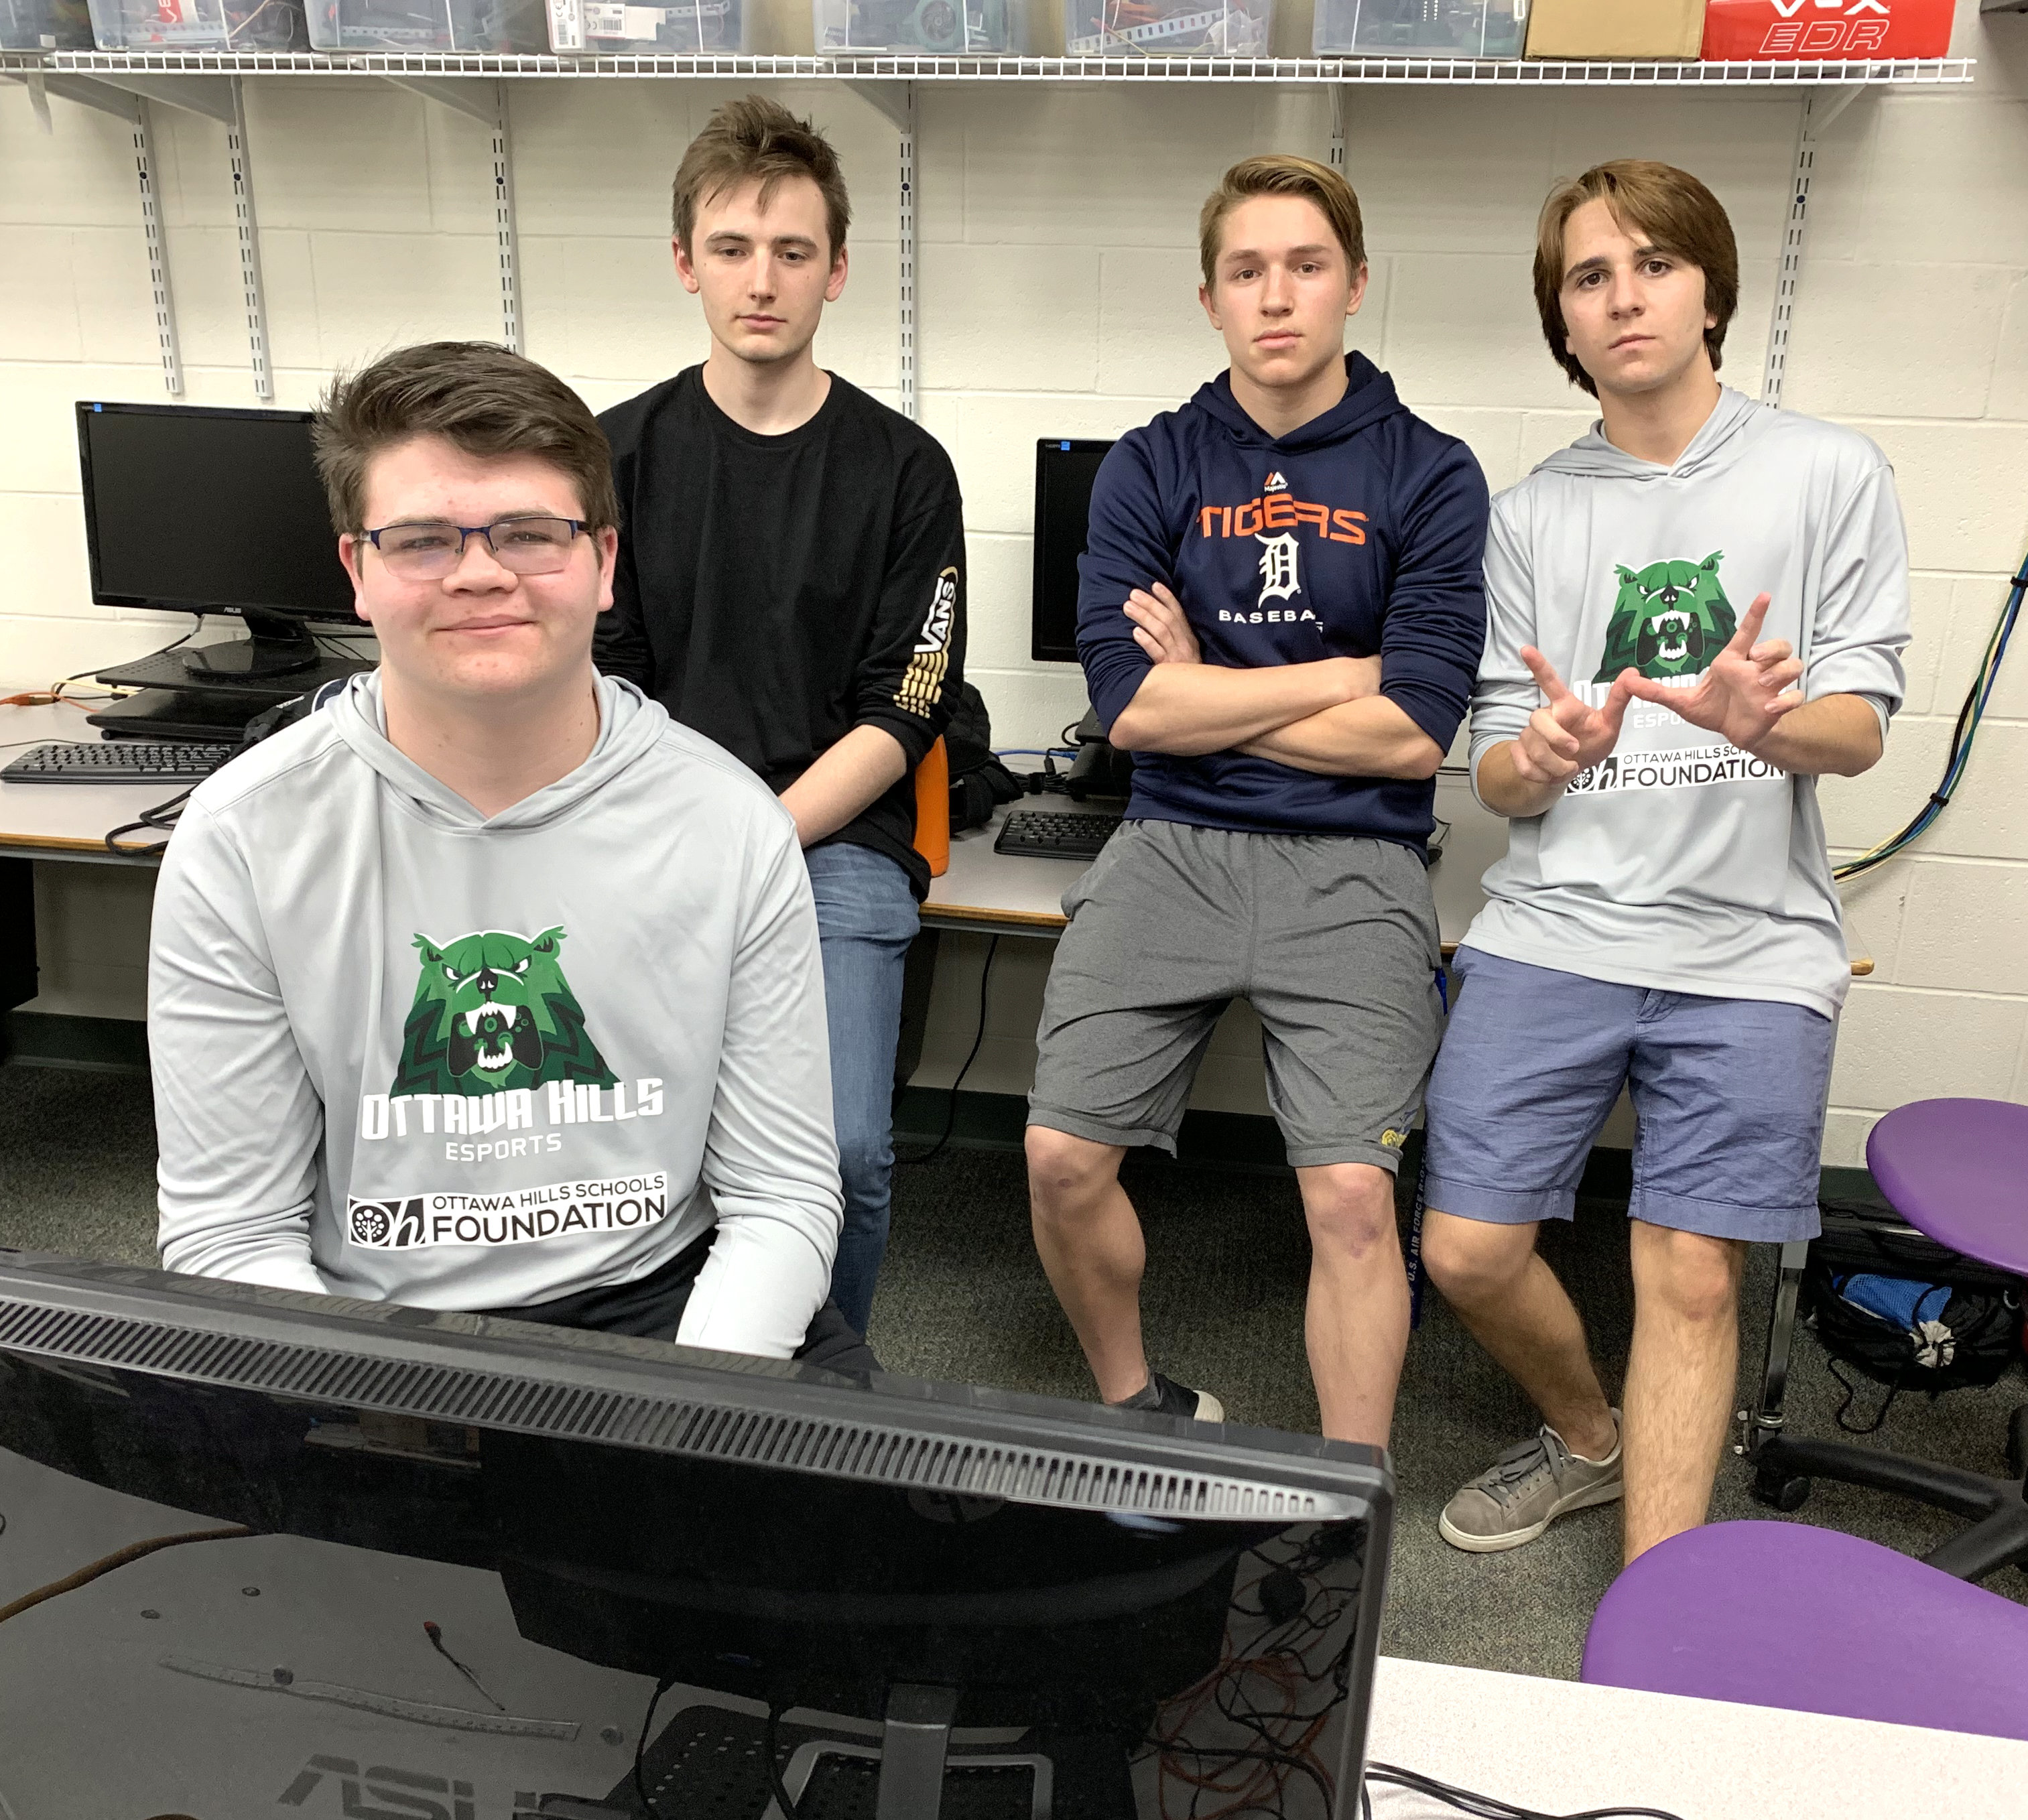 Team members of eSports Club